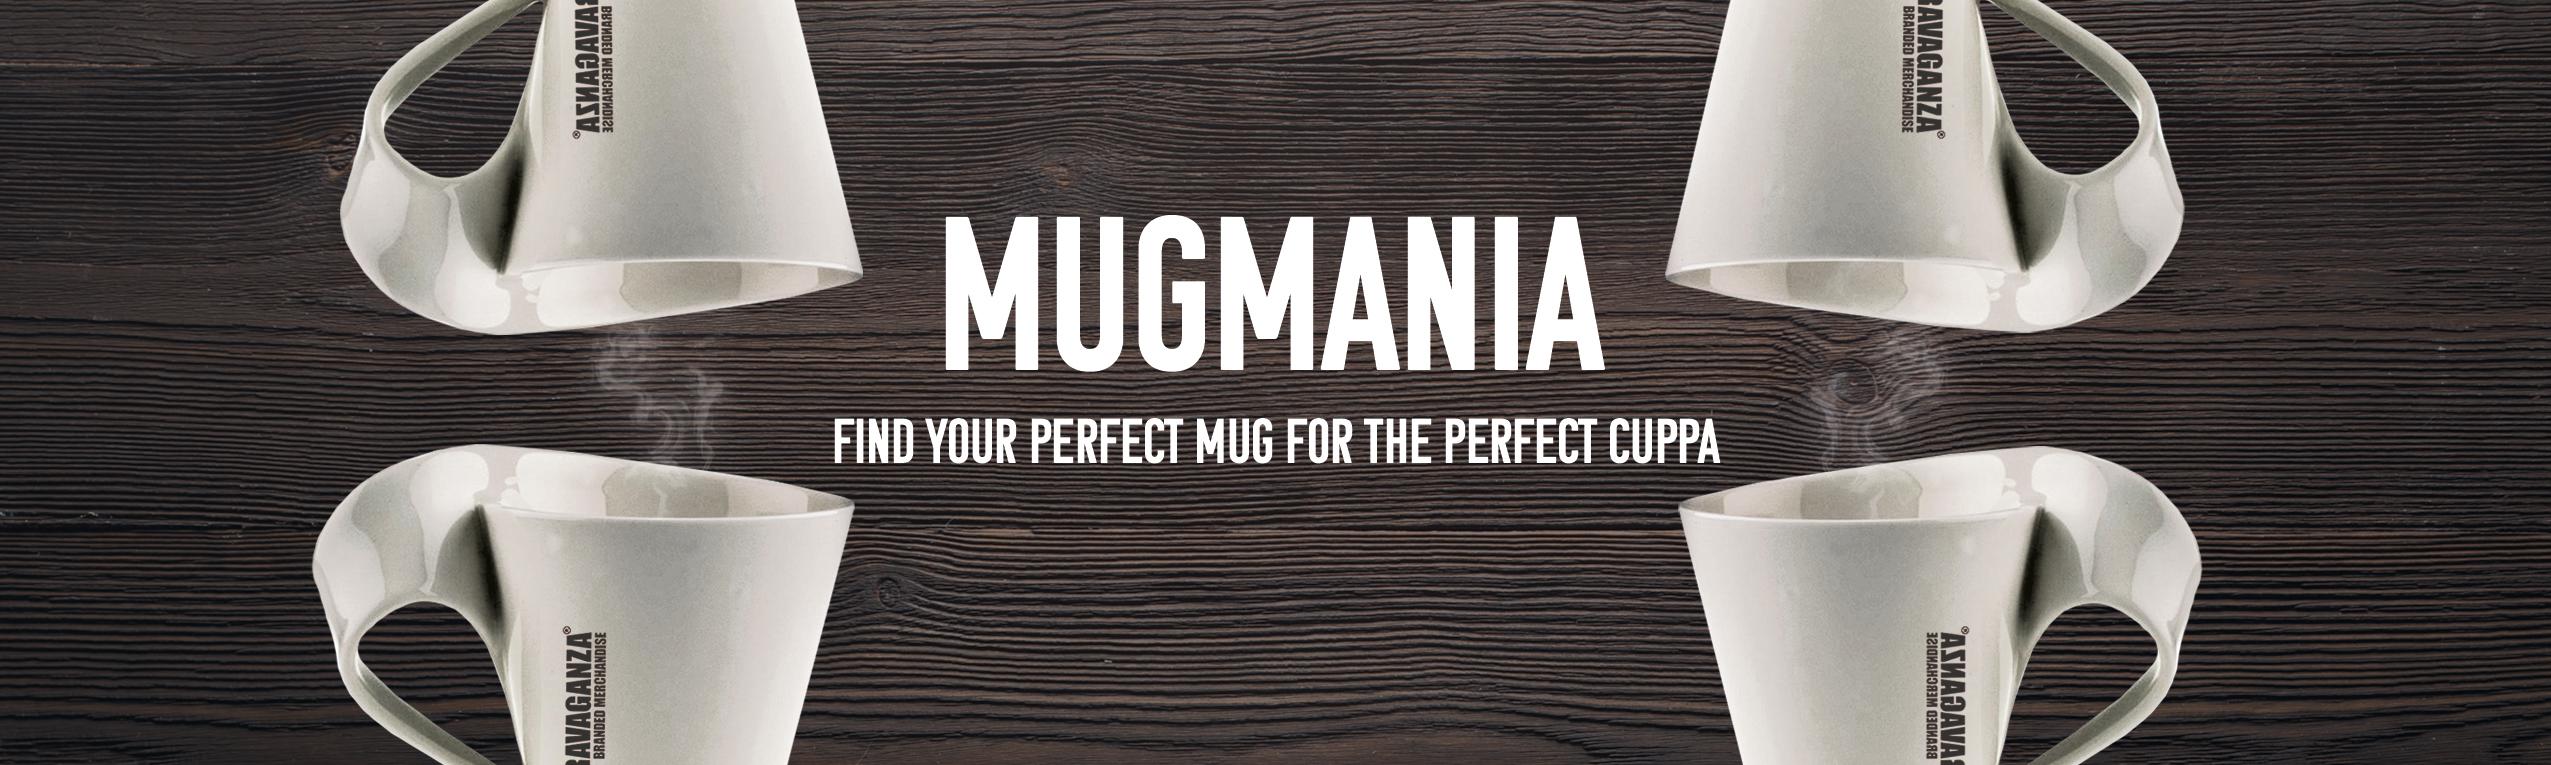 Mug Mania